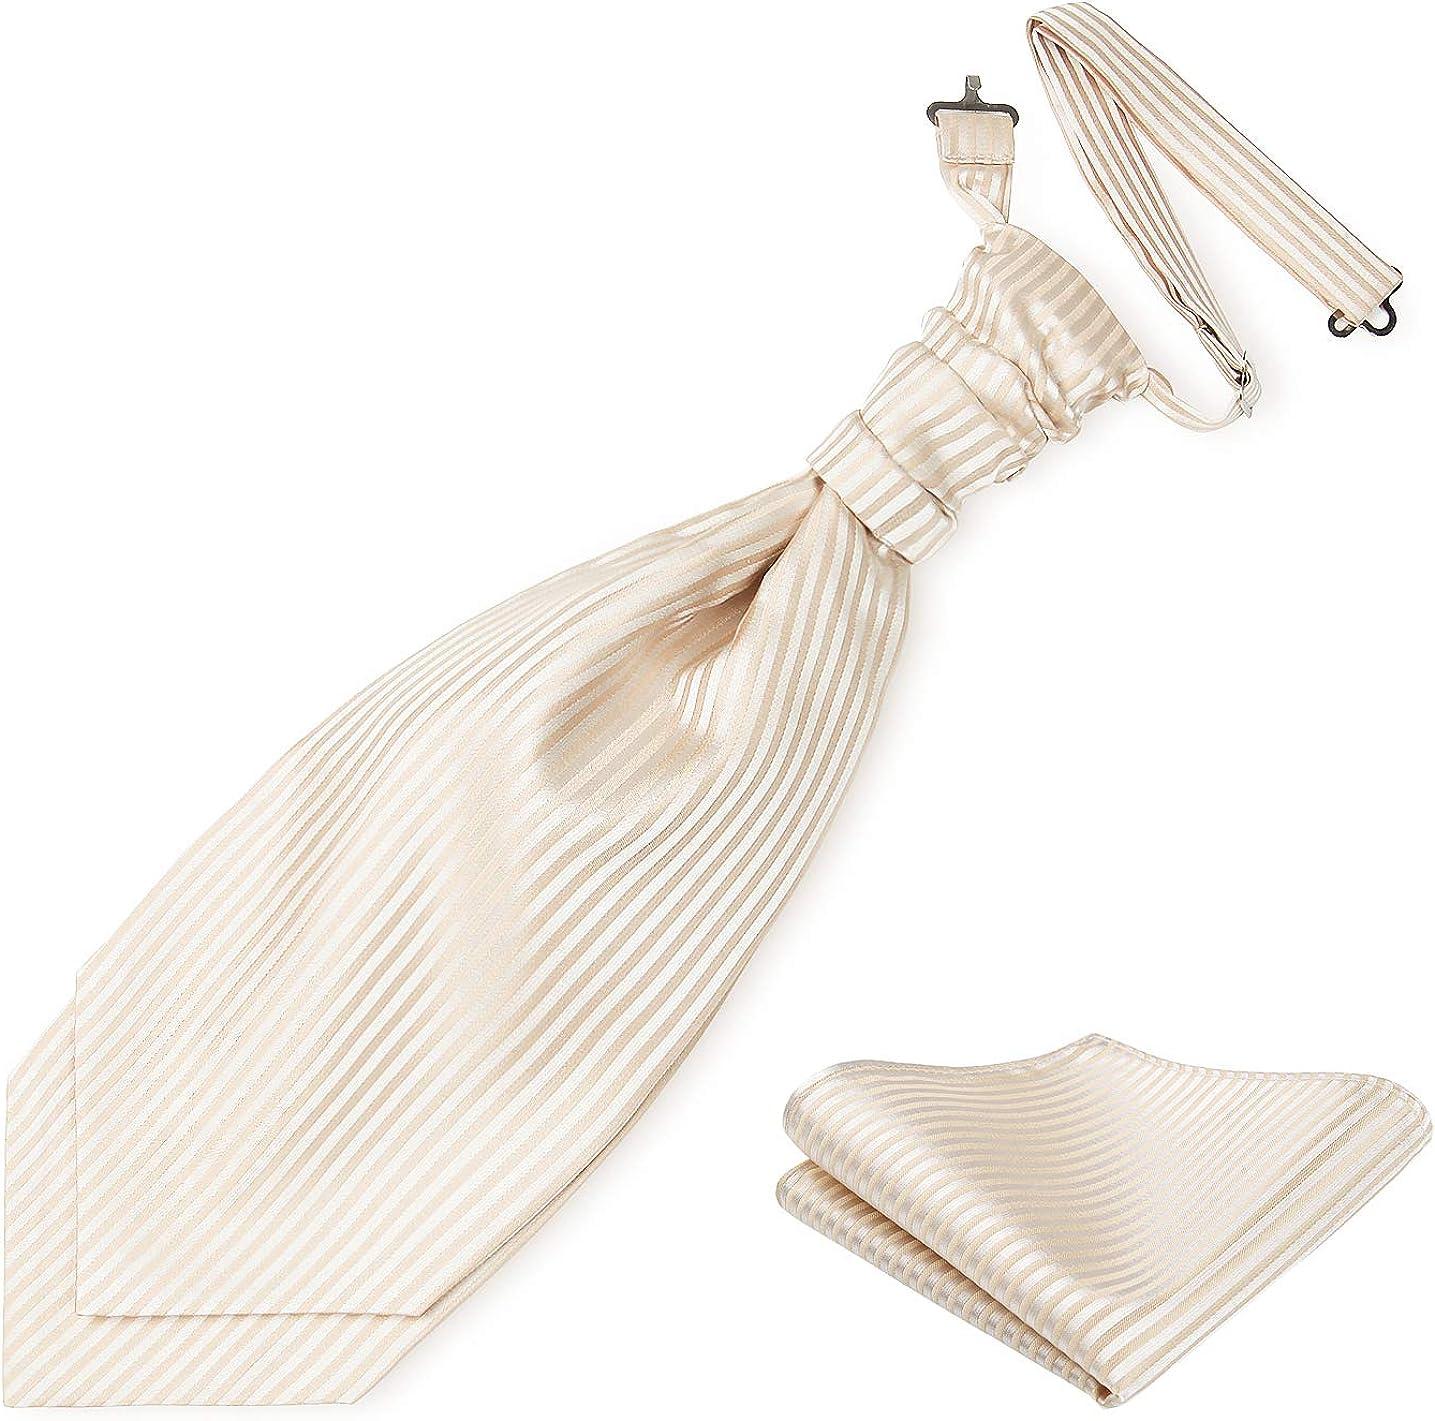 Cravat Ascot Pretied Neckties Luxury Puff Tie for Men Satin Necktie Paisley Floral Tie with Pocket Square Wedding